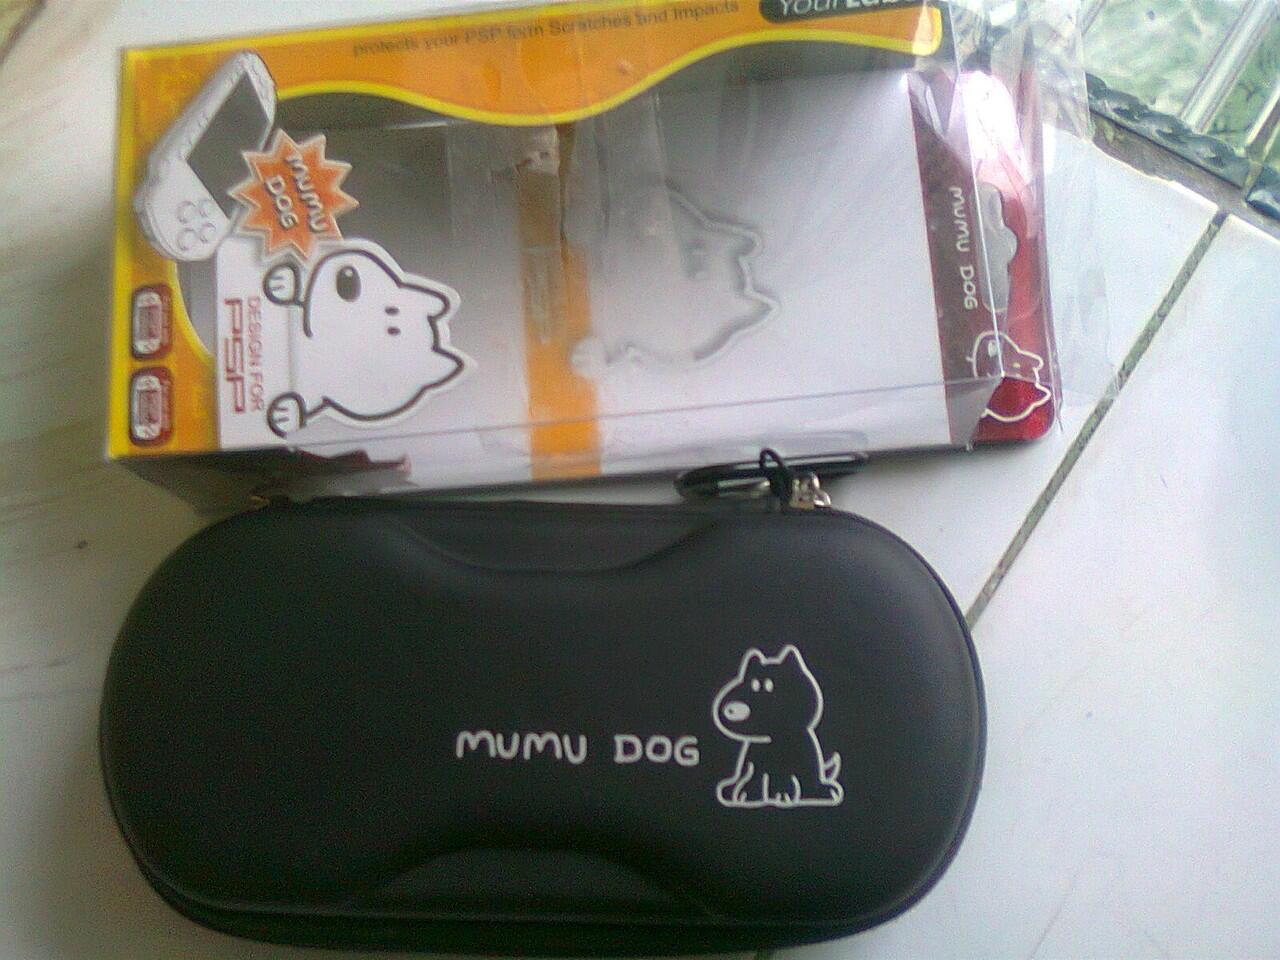 jual memory psp 300x 16gb full game + pouch mumu dog murah banget